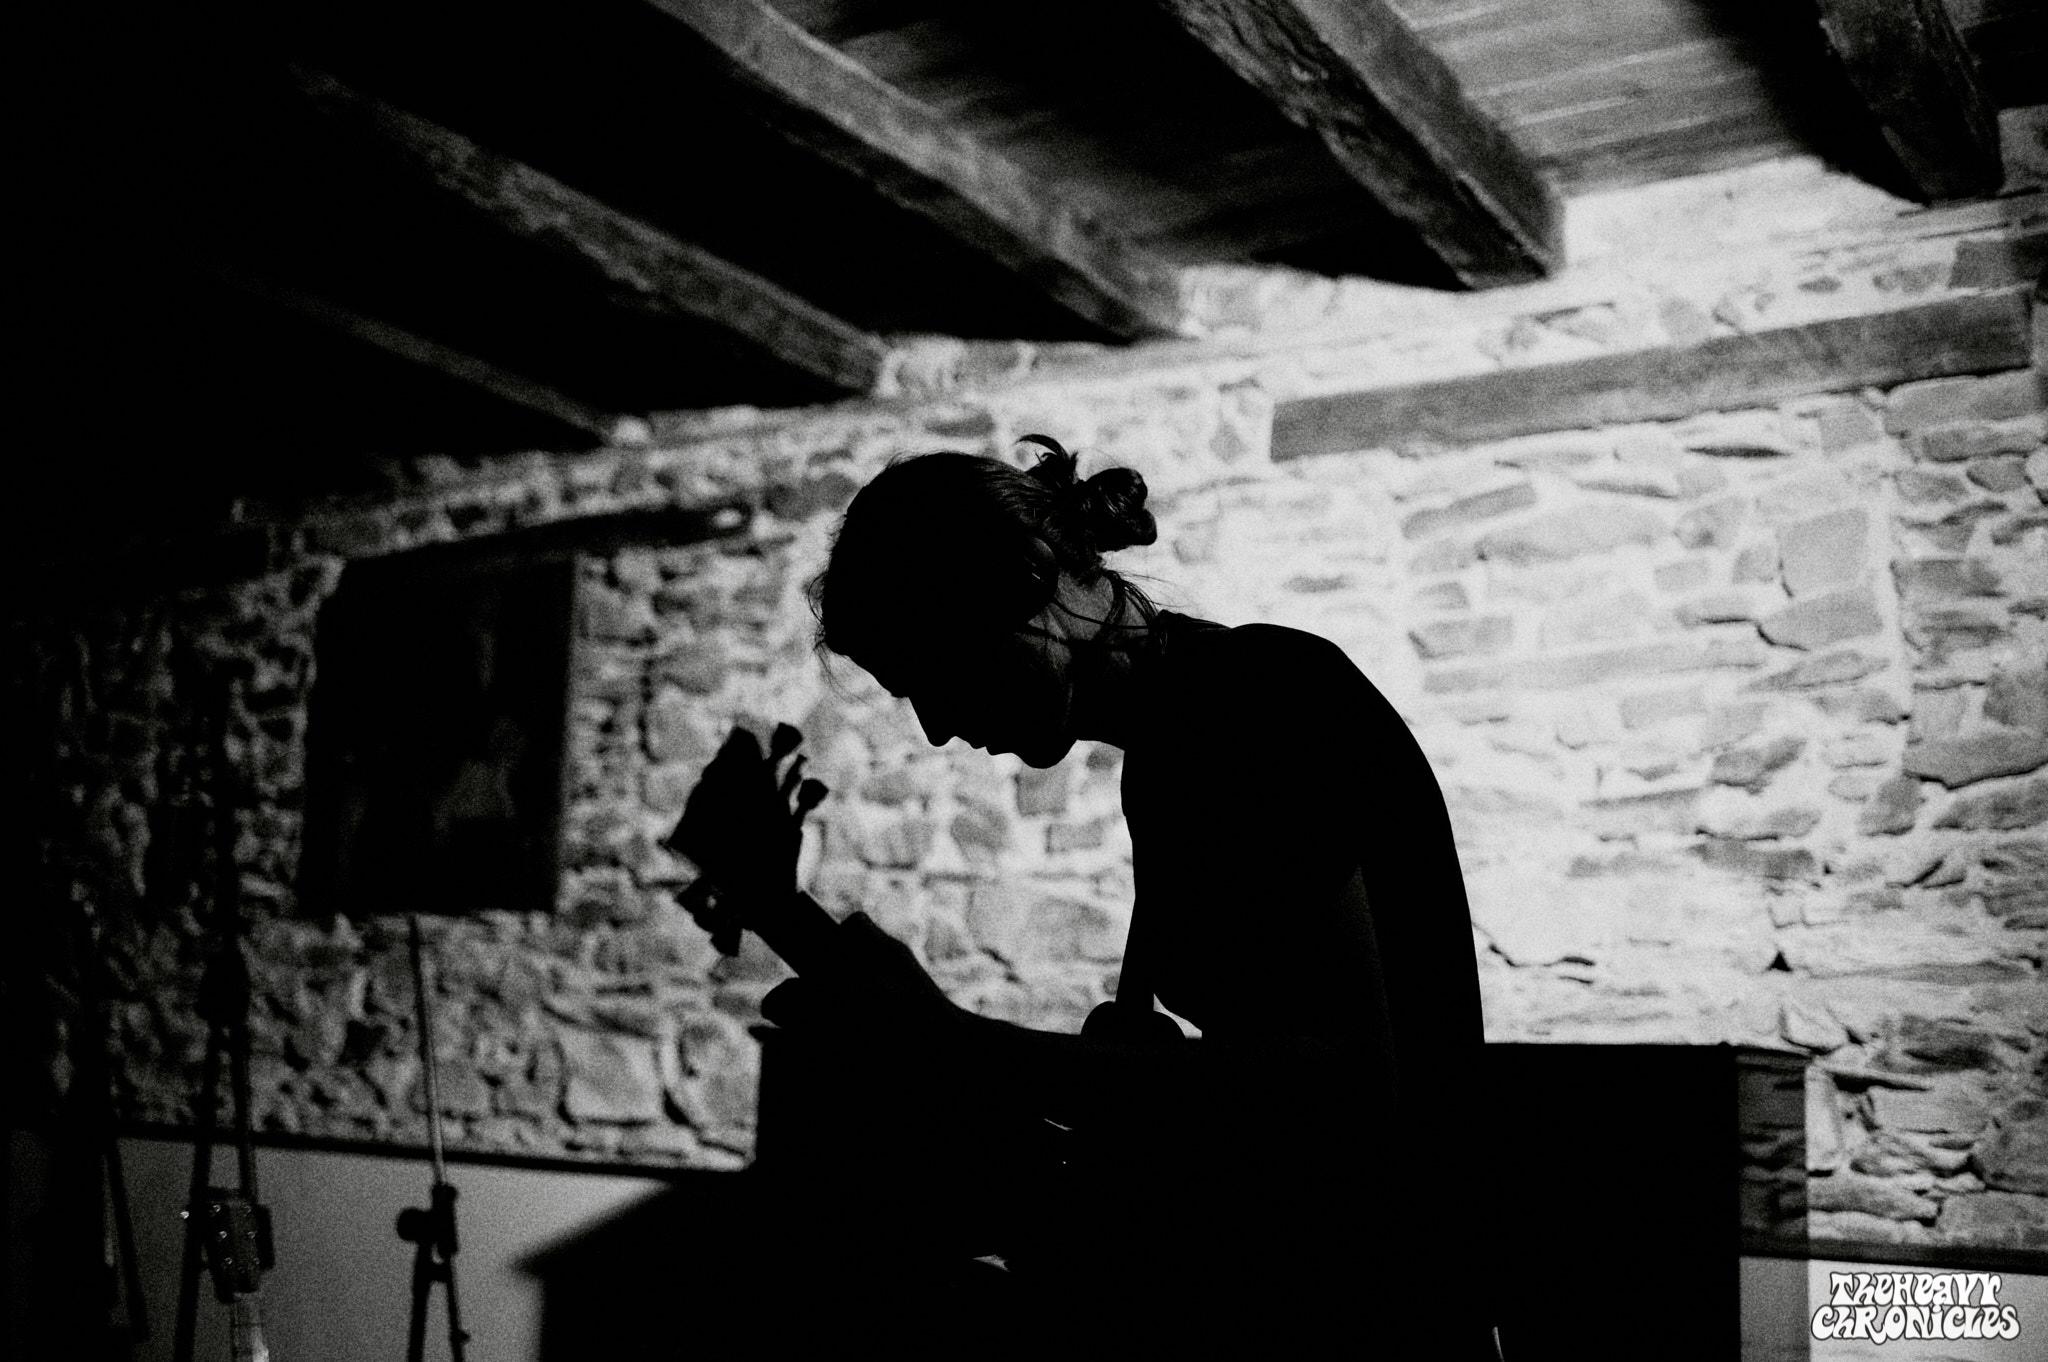 Elder-Studio-Black-Box-2019-Gael-Mathieu-The-Heavy-Chronicles-110